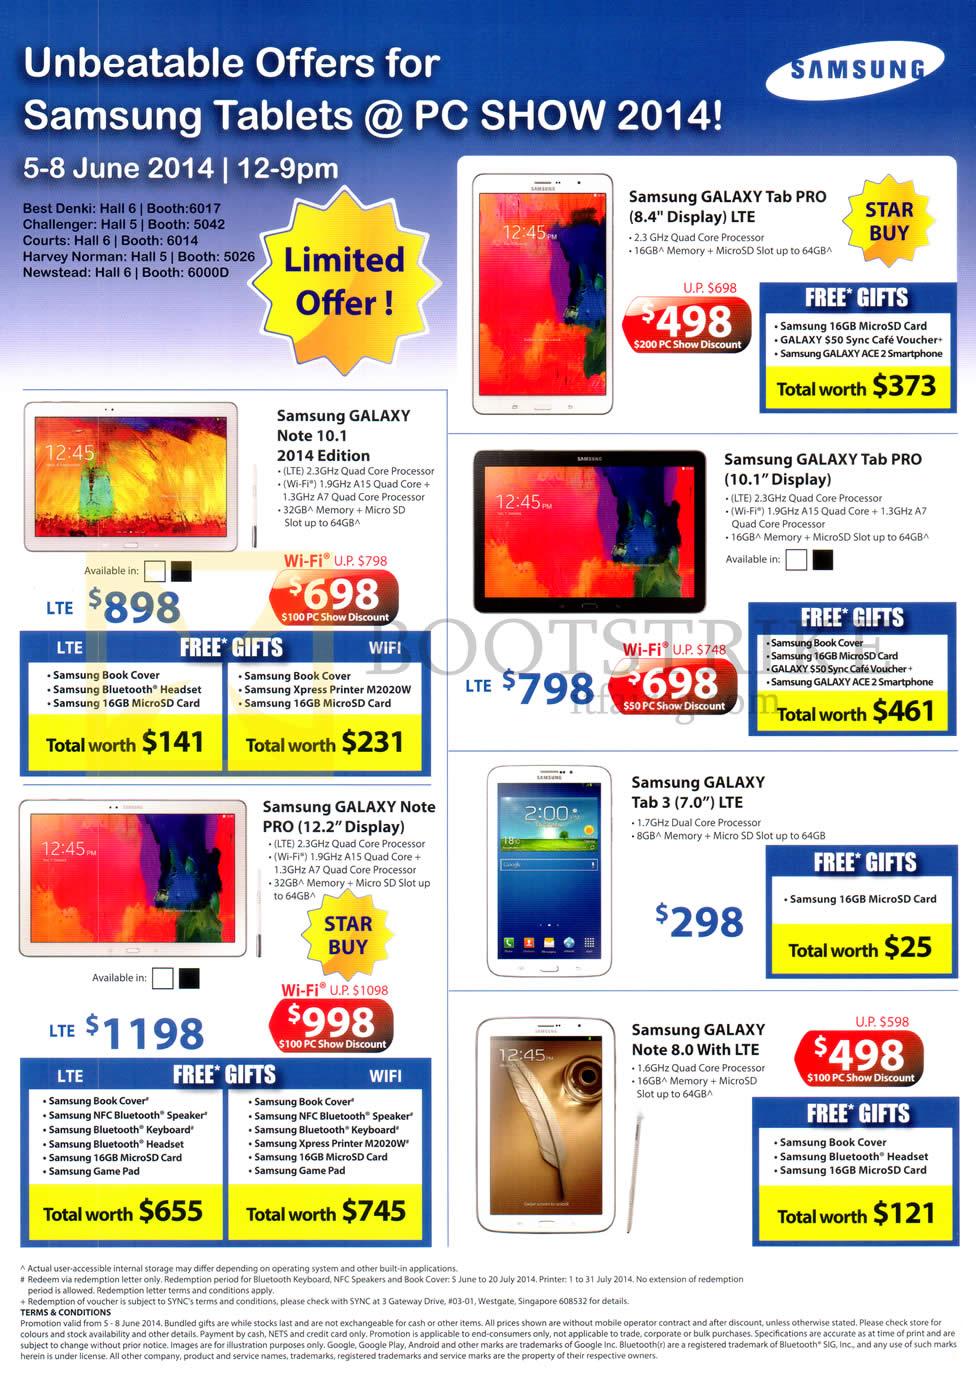 Samsung Galaxy Tab Pro 8 4, 10 1, Note 10 1, Note Pro 12 2, Tab 3